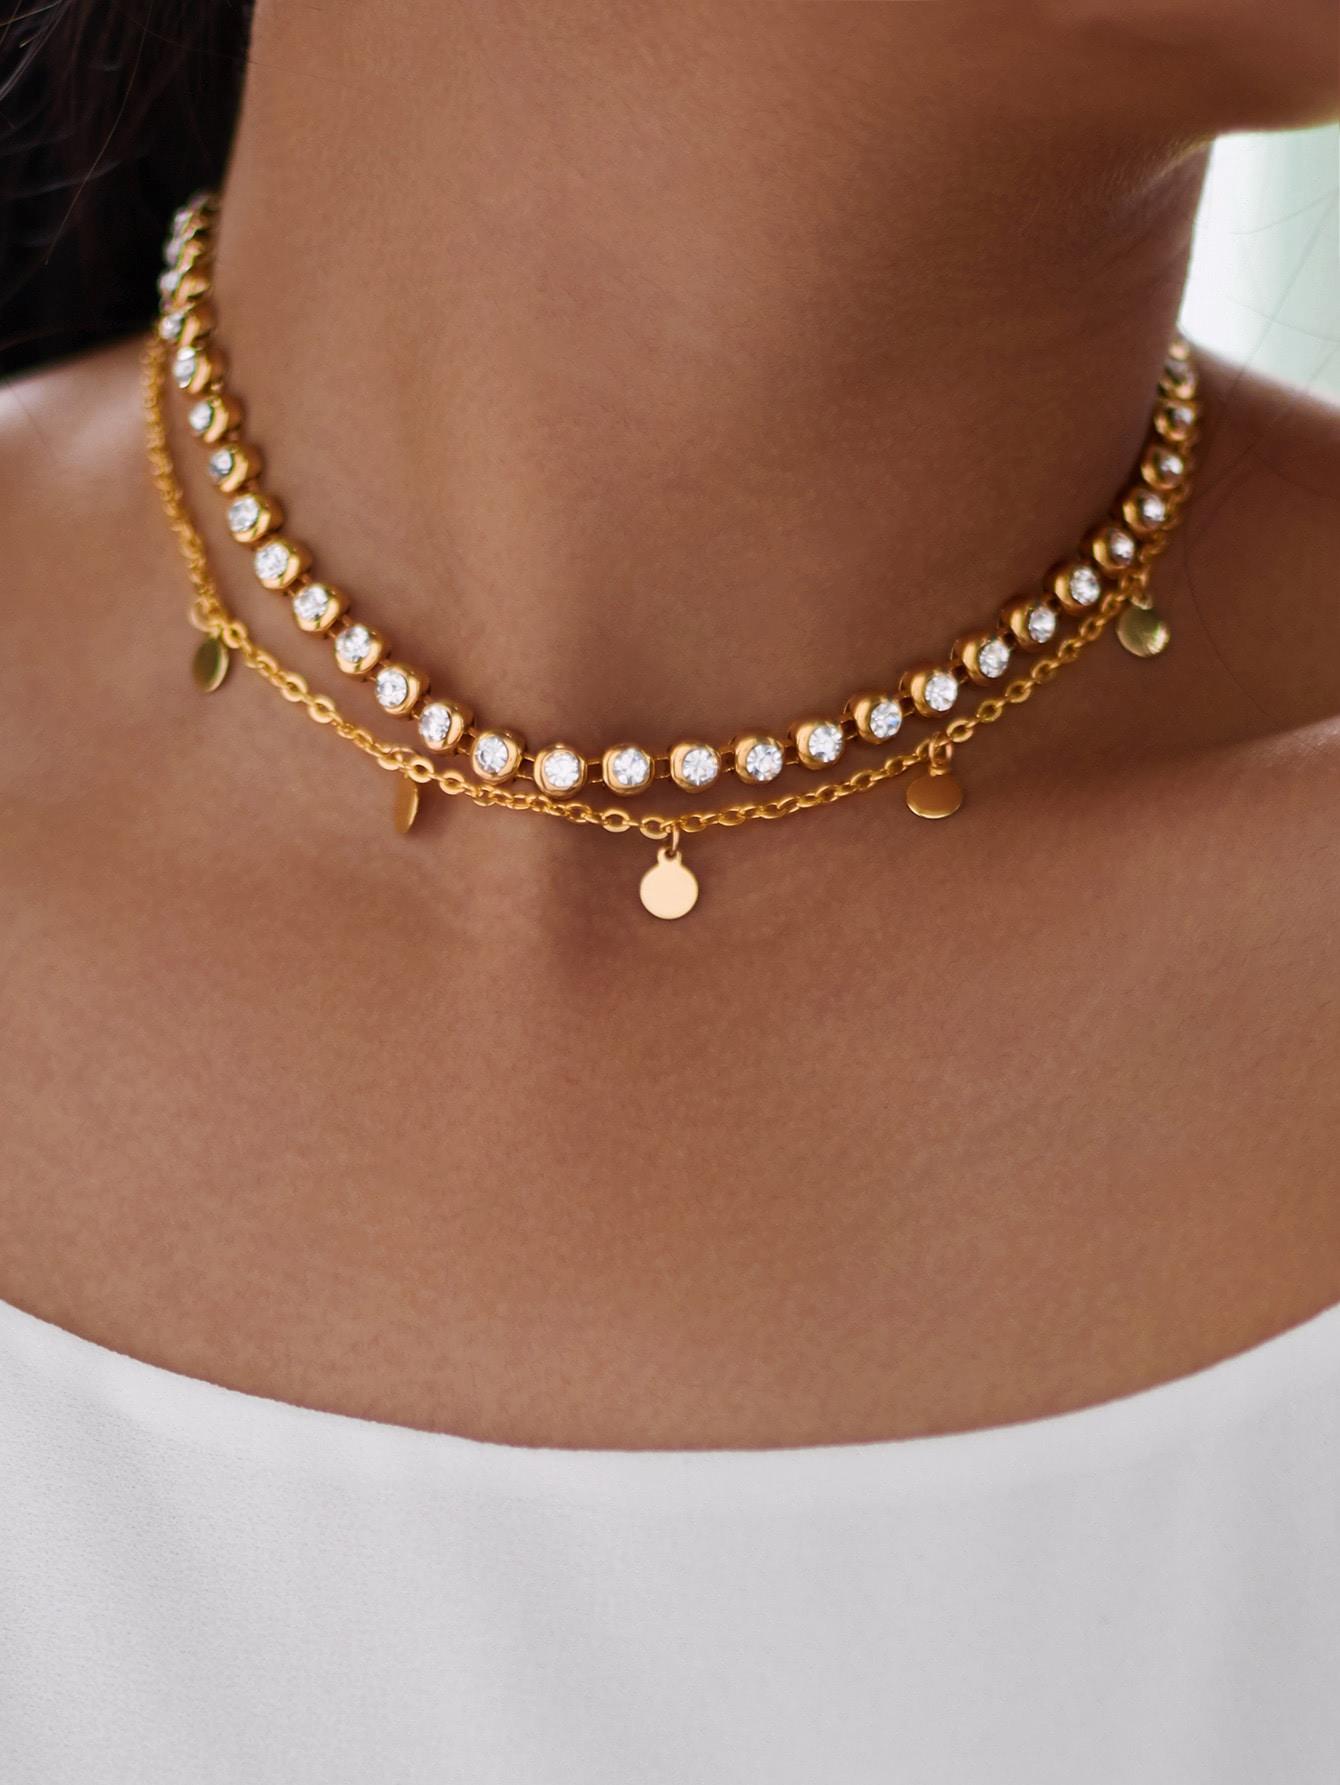 Rhinestone & Sequin Design Chain Necklace sequin overlay triangle design necklace